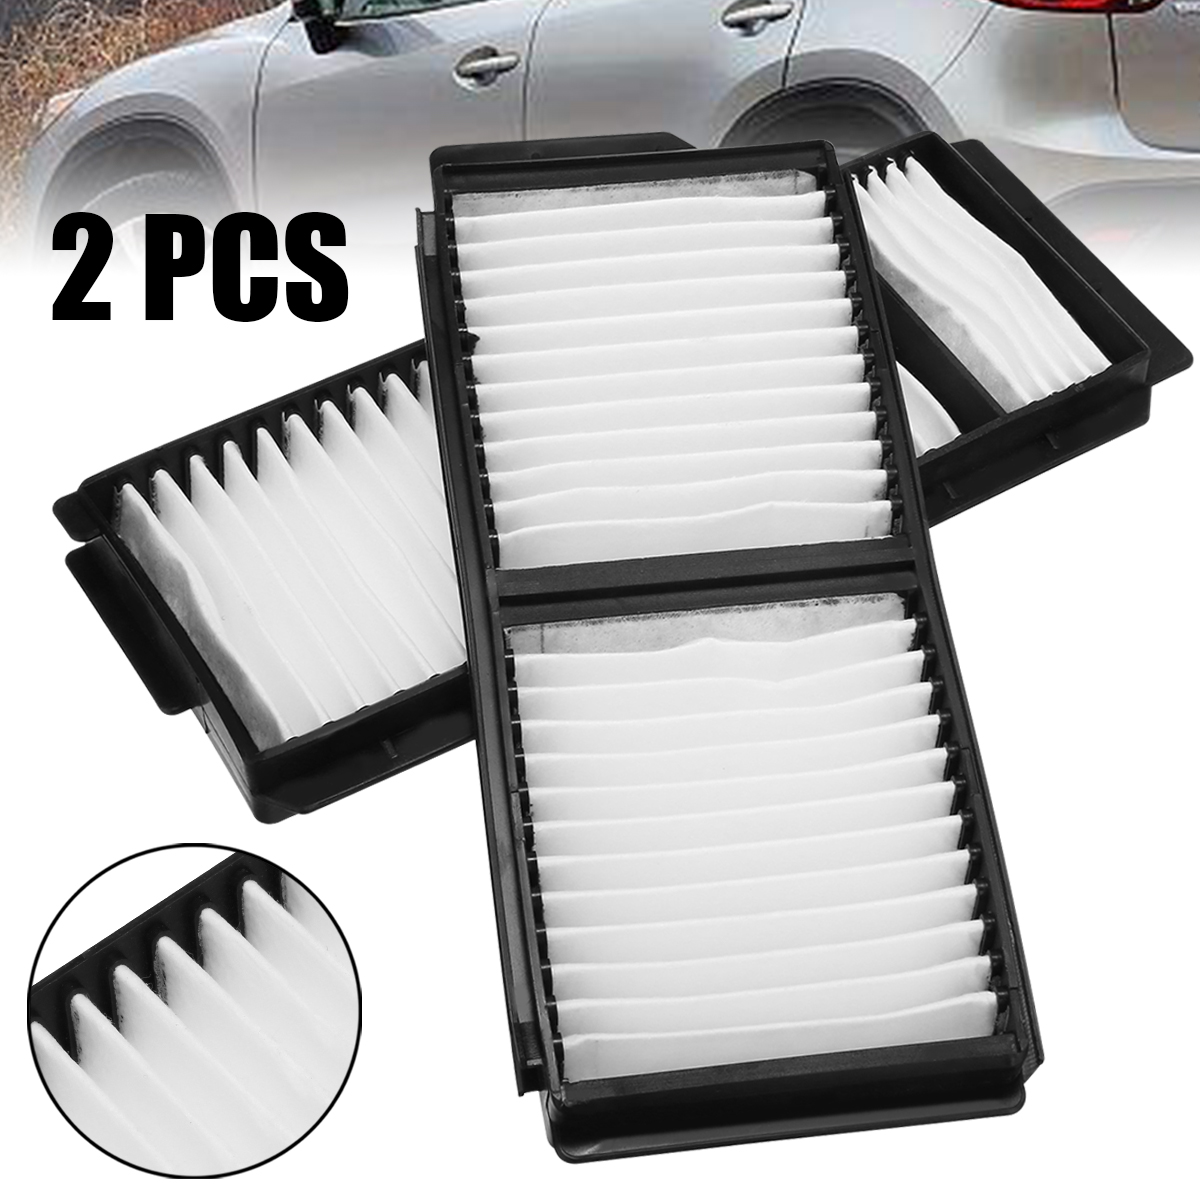 Automobiles Filters Set 2pcs White Cabin Air Filter For Mazda 3 5 OEM:BP4K-61-J6X